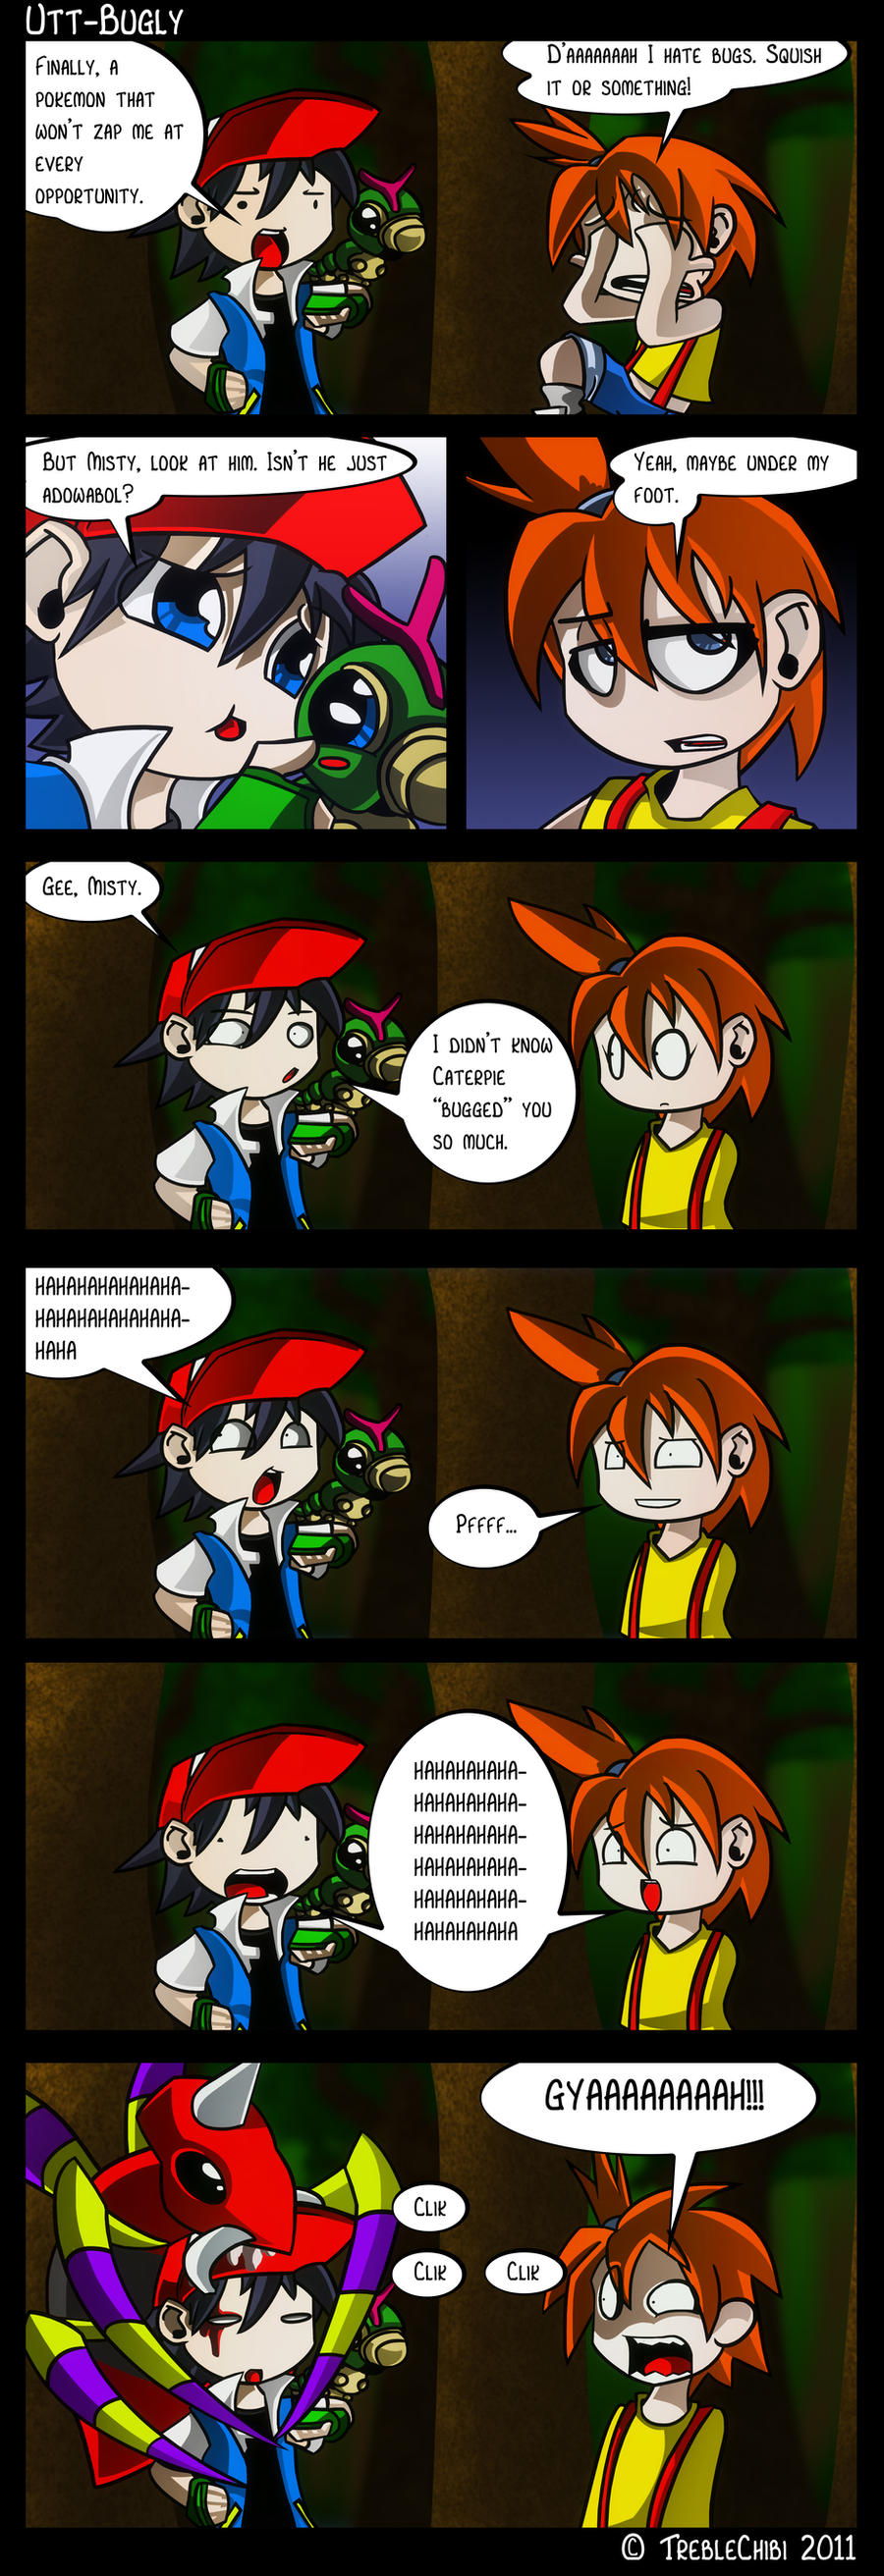 Misty Hates Bug Pokemon by DukeStewart